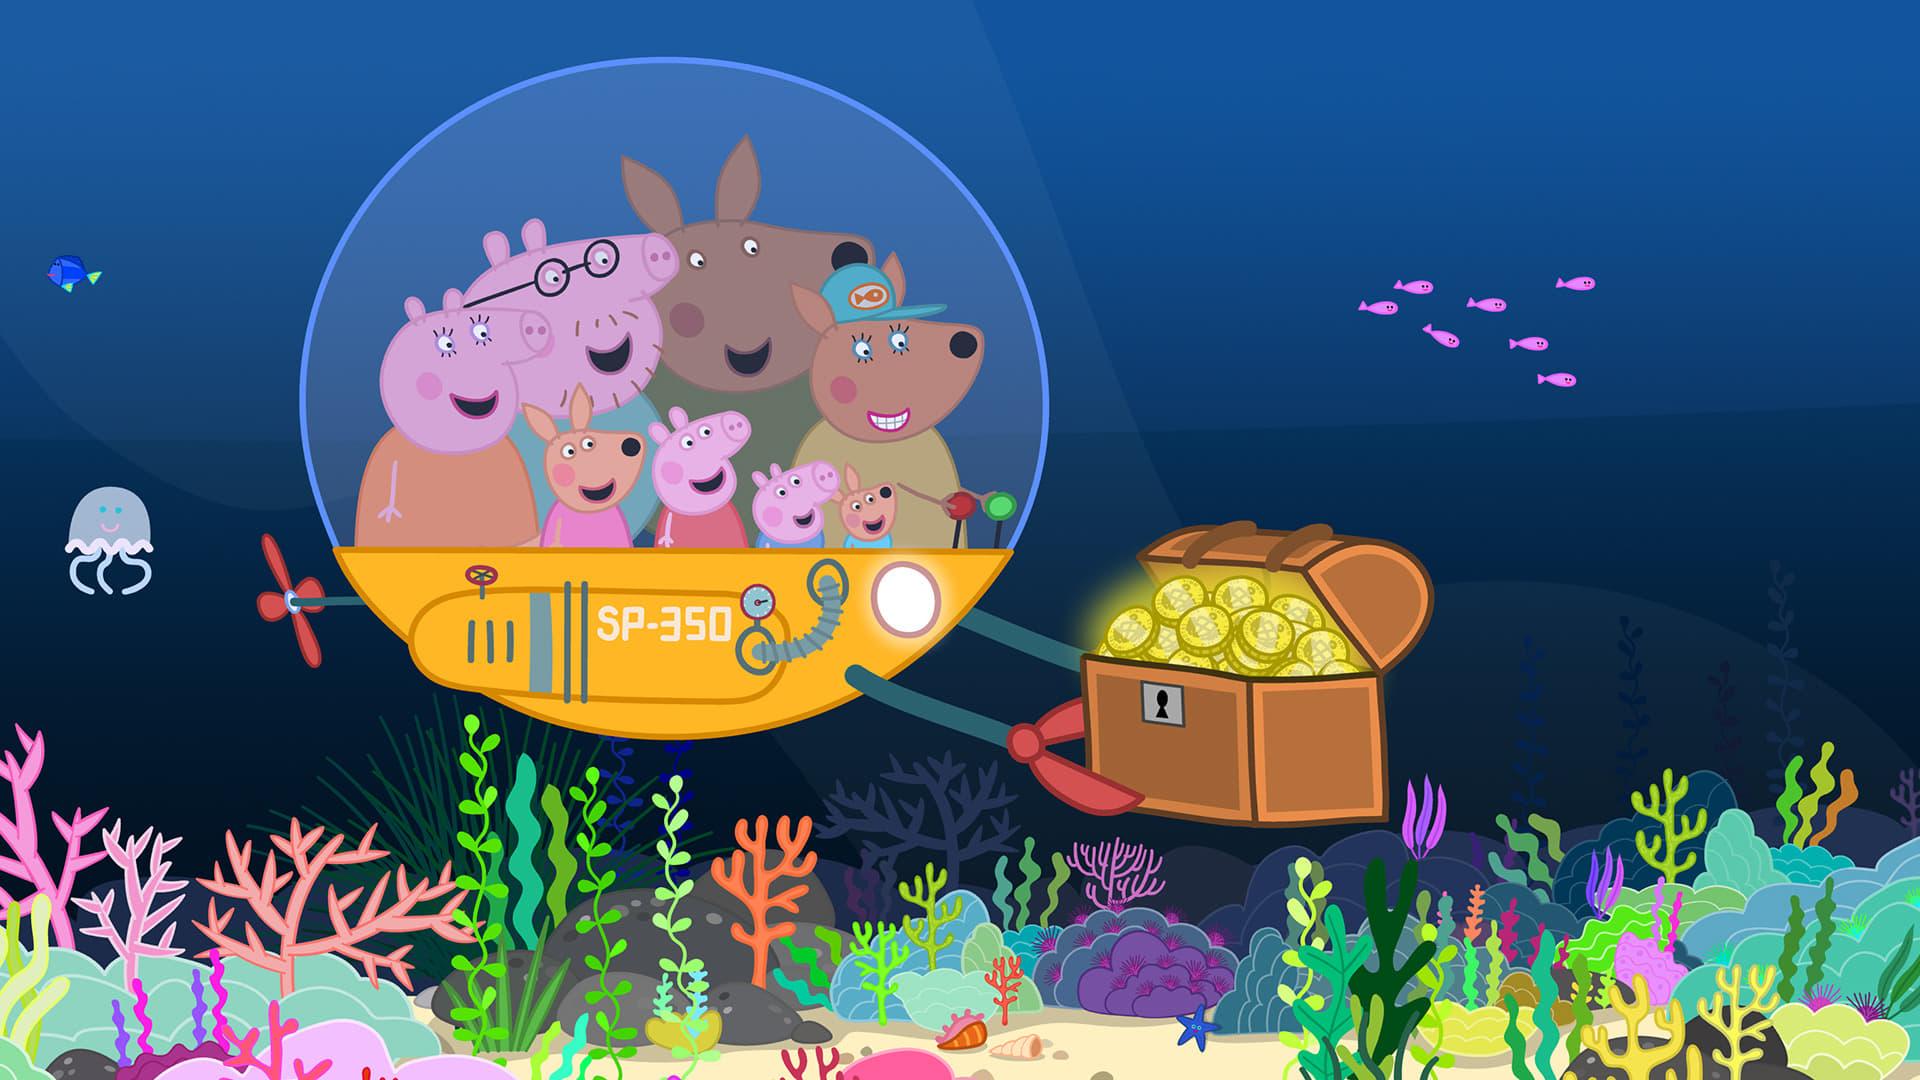 Peppa Pig Season 5 :Episode 21  Australia Part 3 - The Great Barrier Reef